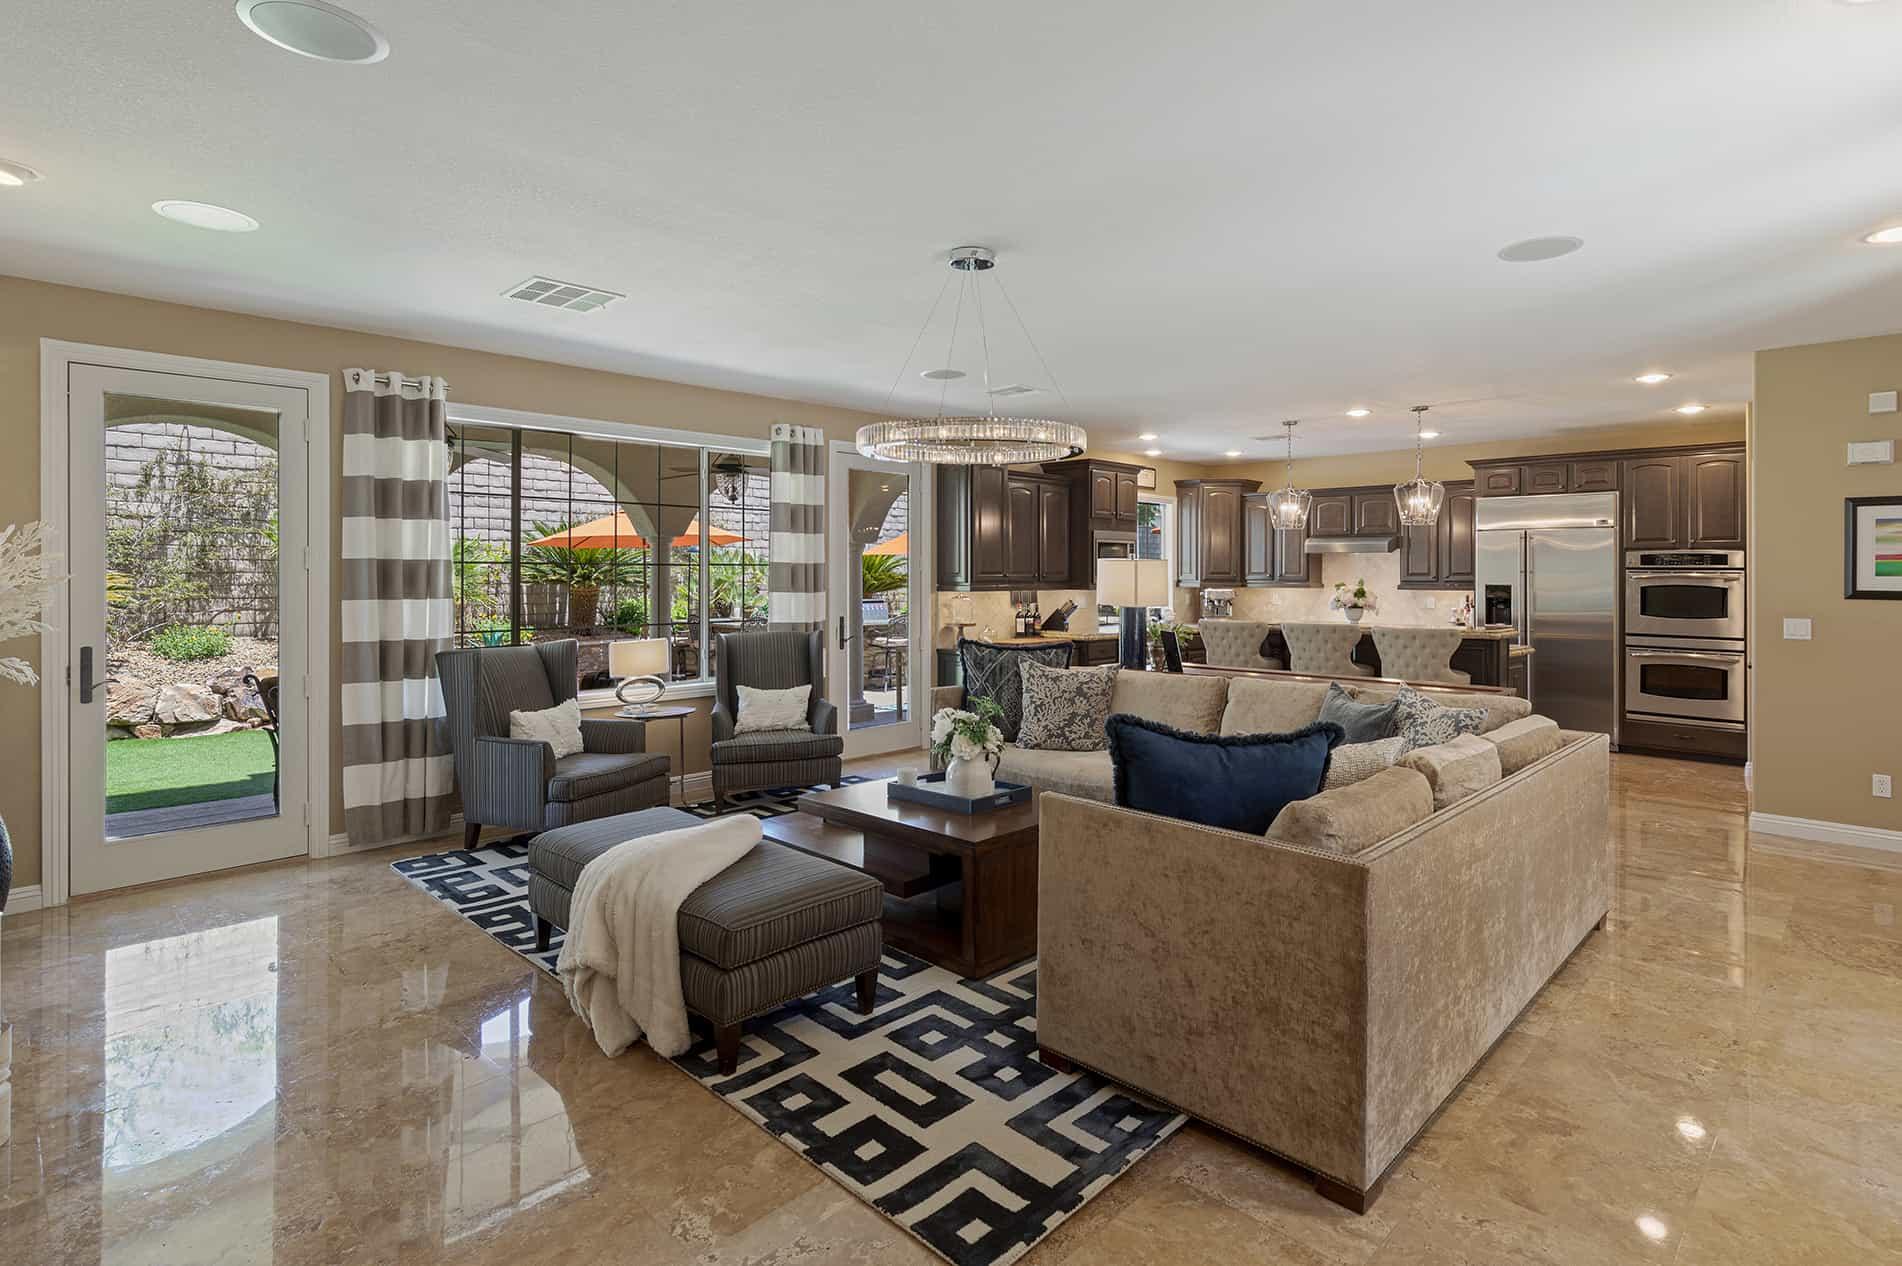 las-vegas-luxry-real-estate-realtor-rob-jensen-company-12108-vista-linda-avenue-the-paseos021